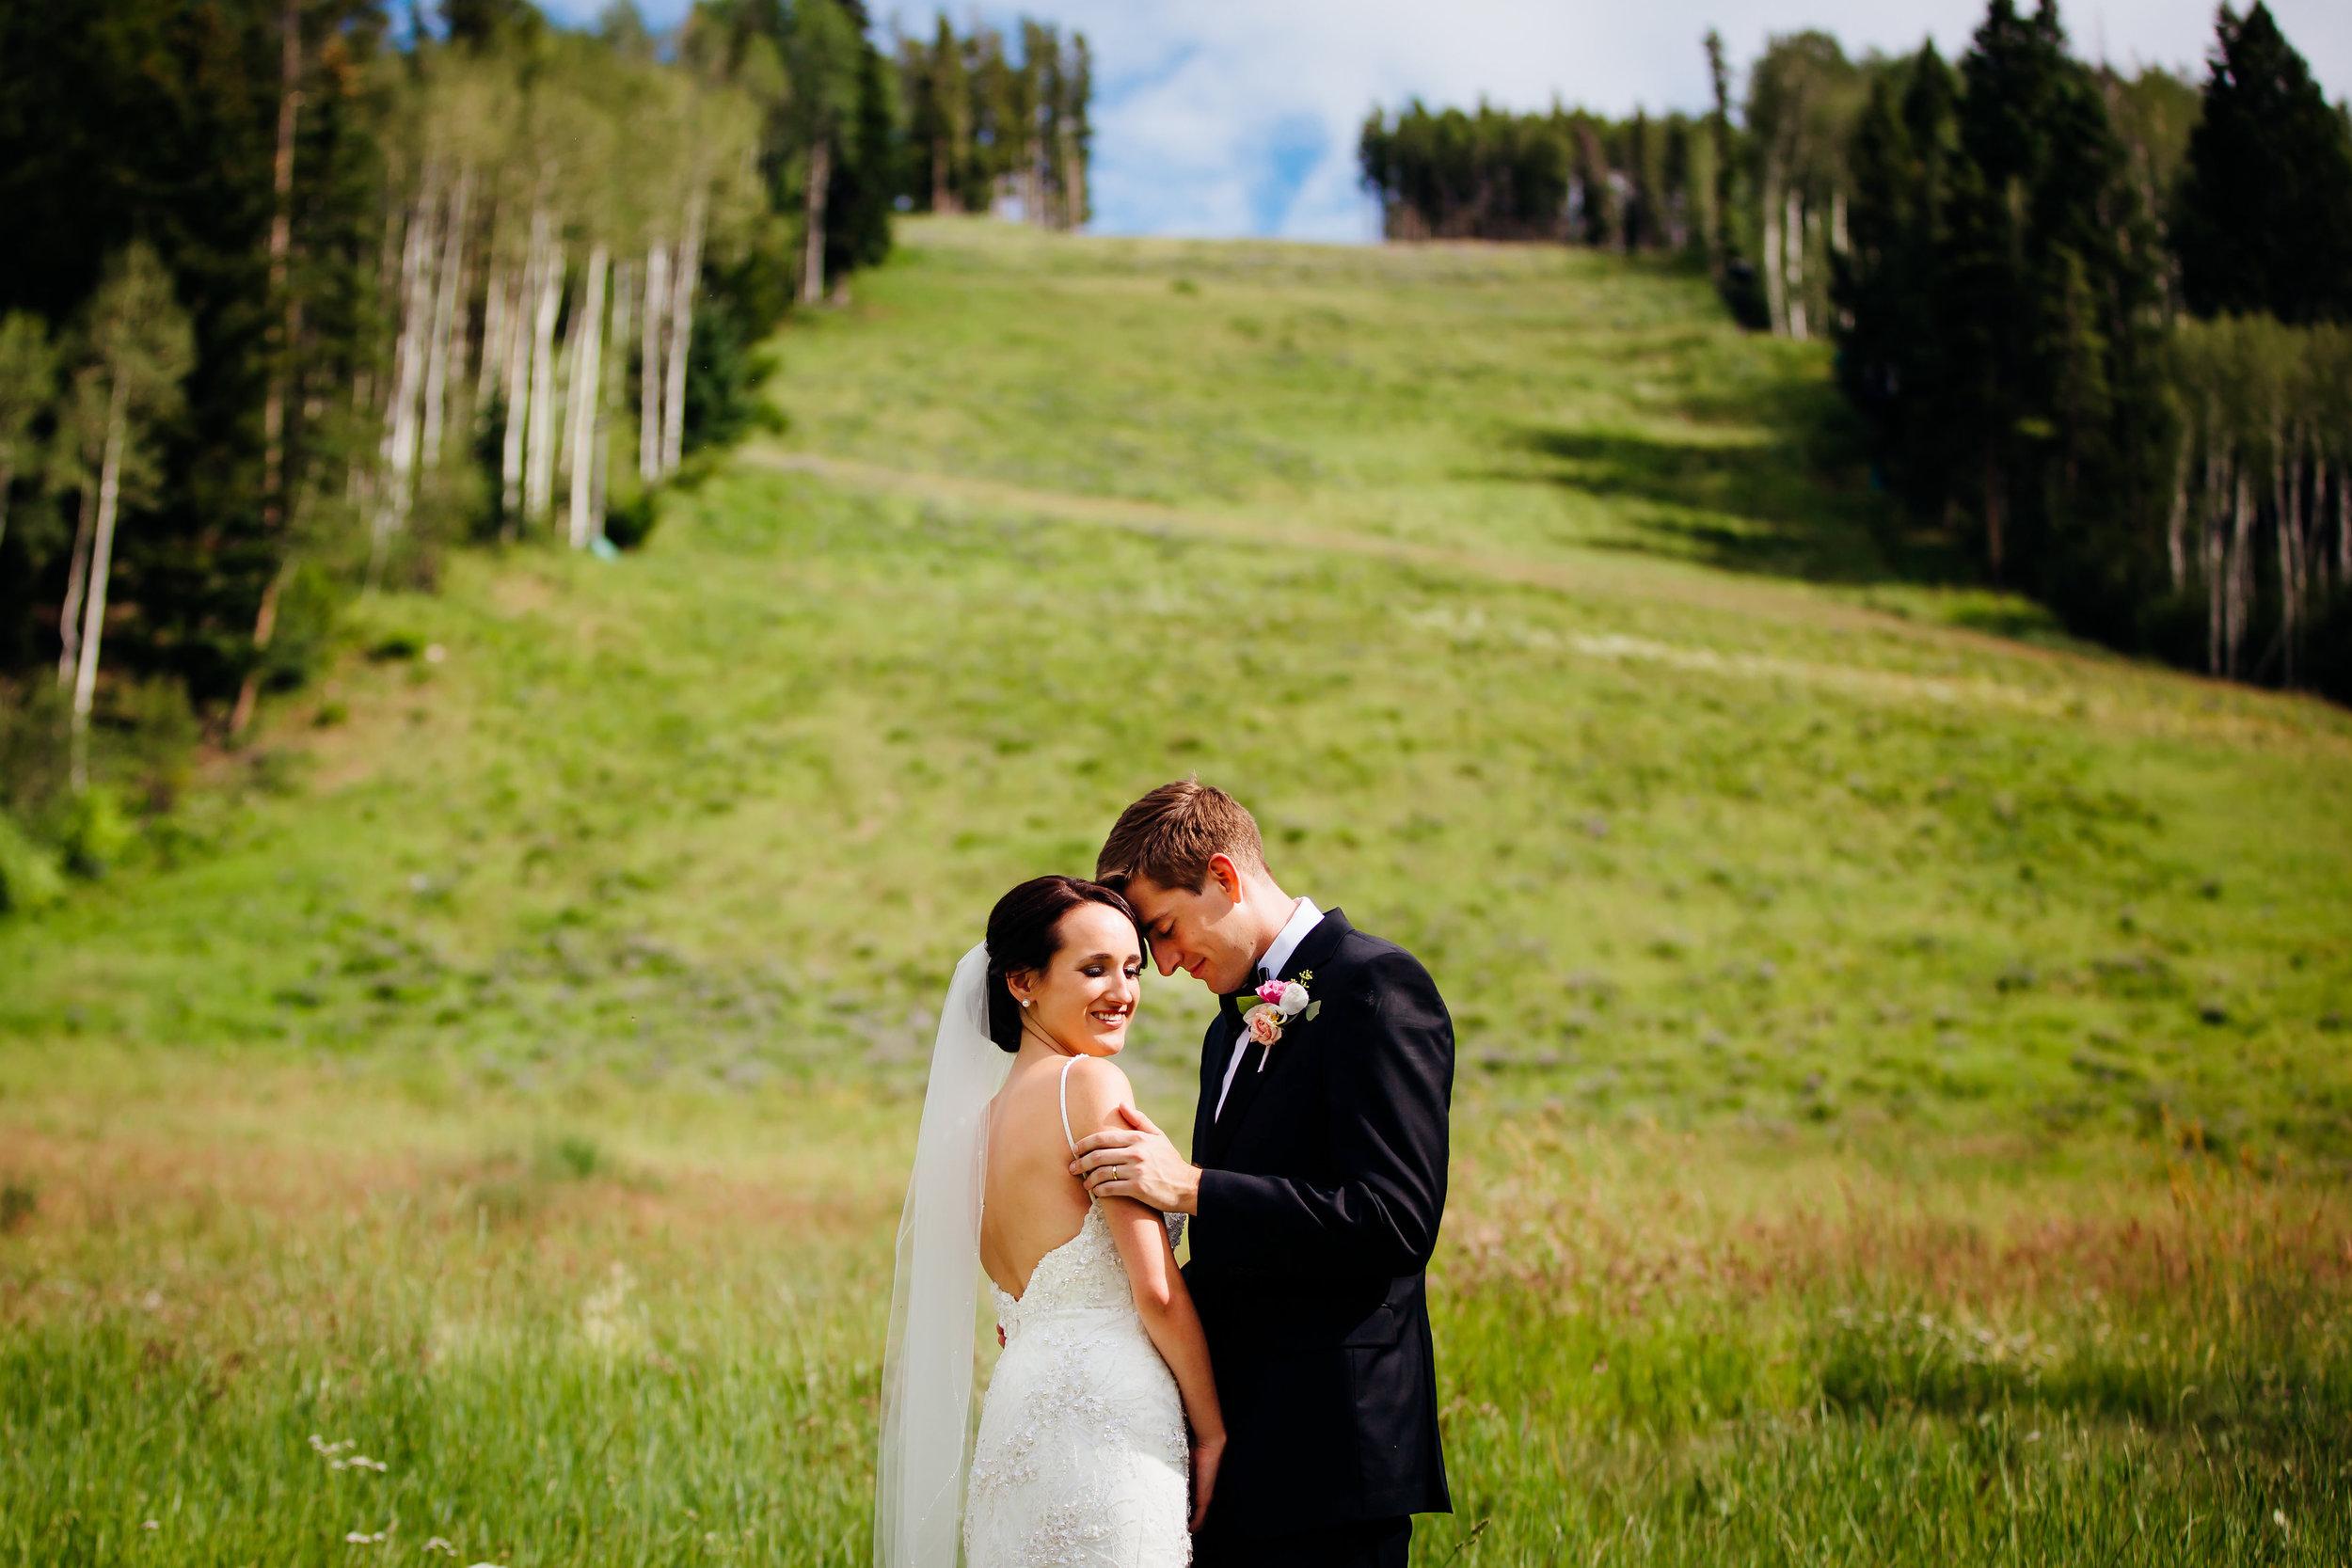 -Park Hyatt Beaver Creek Resort and Spa Wedding - Beaver Creek Wedding Photographer -450.jpg